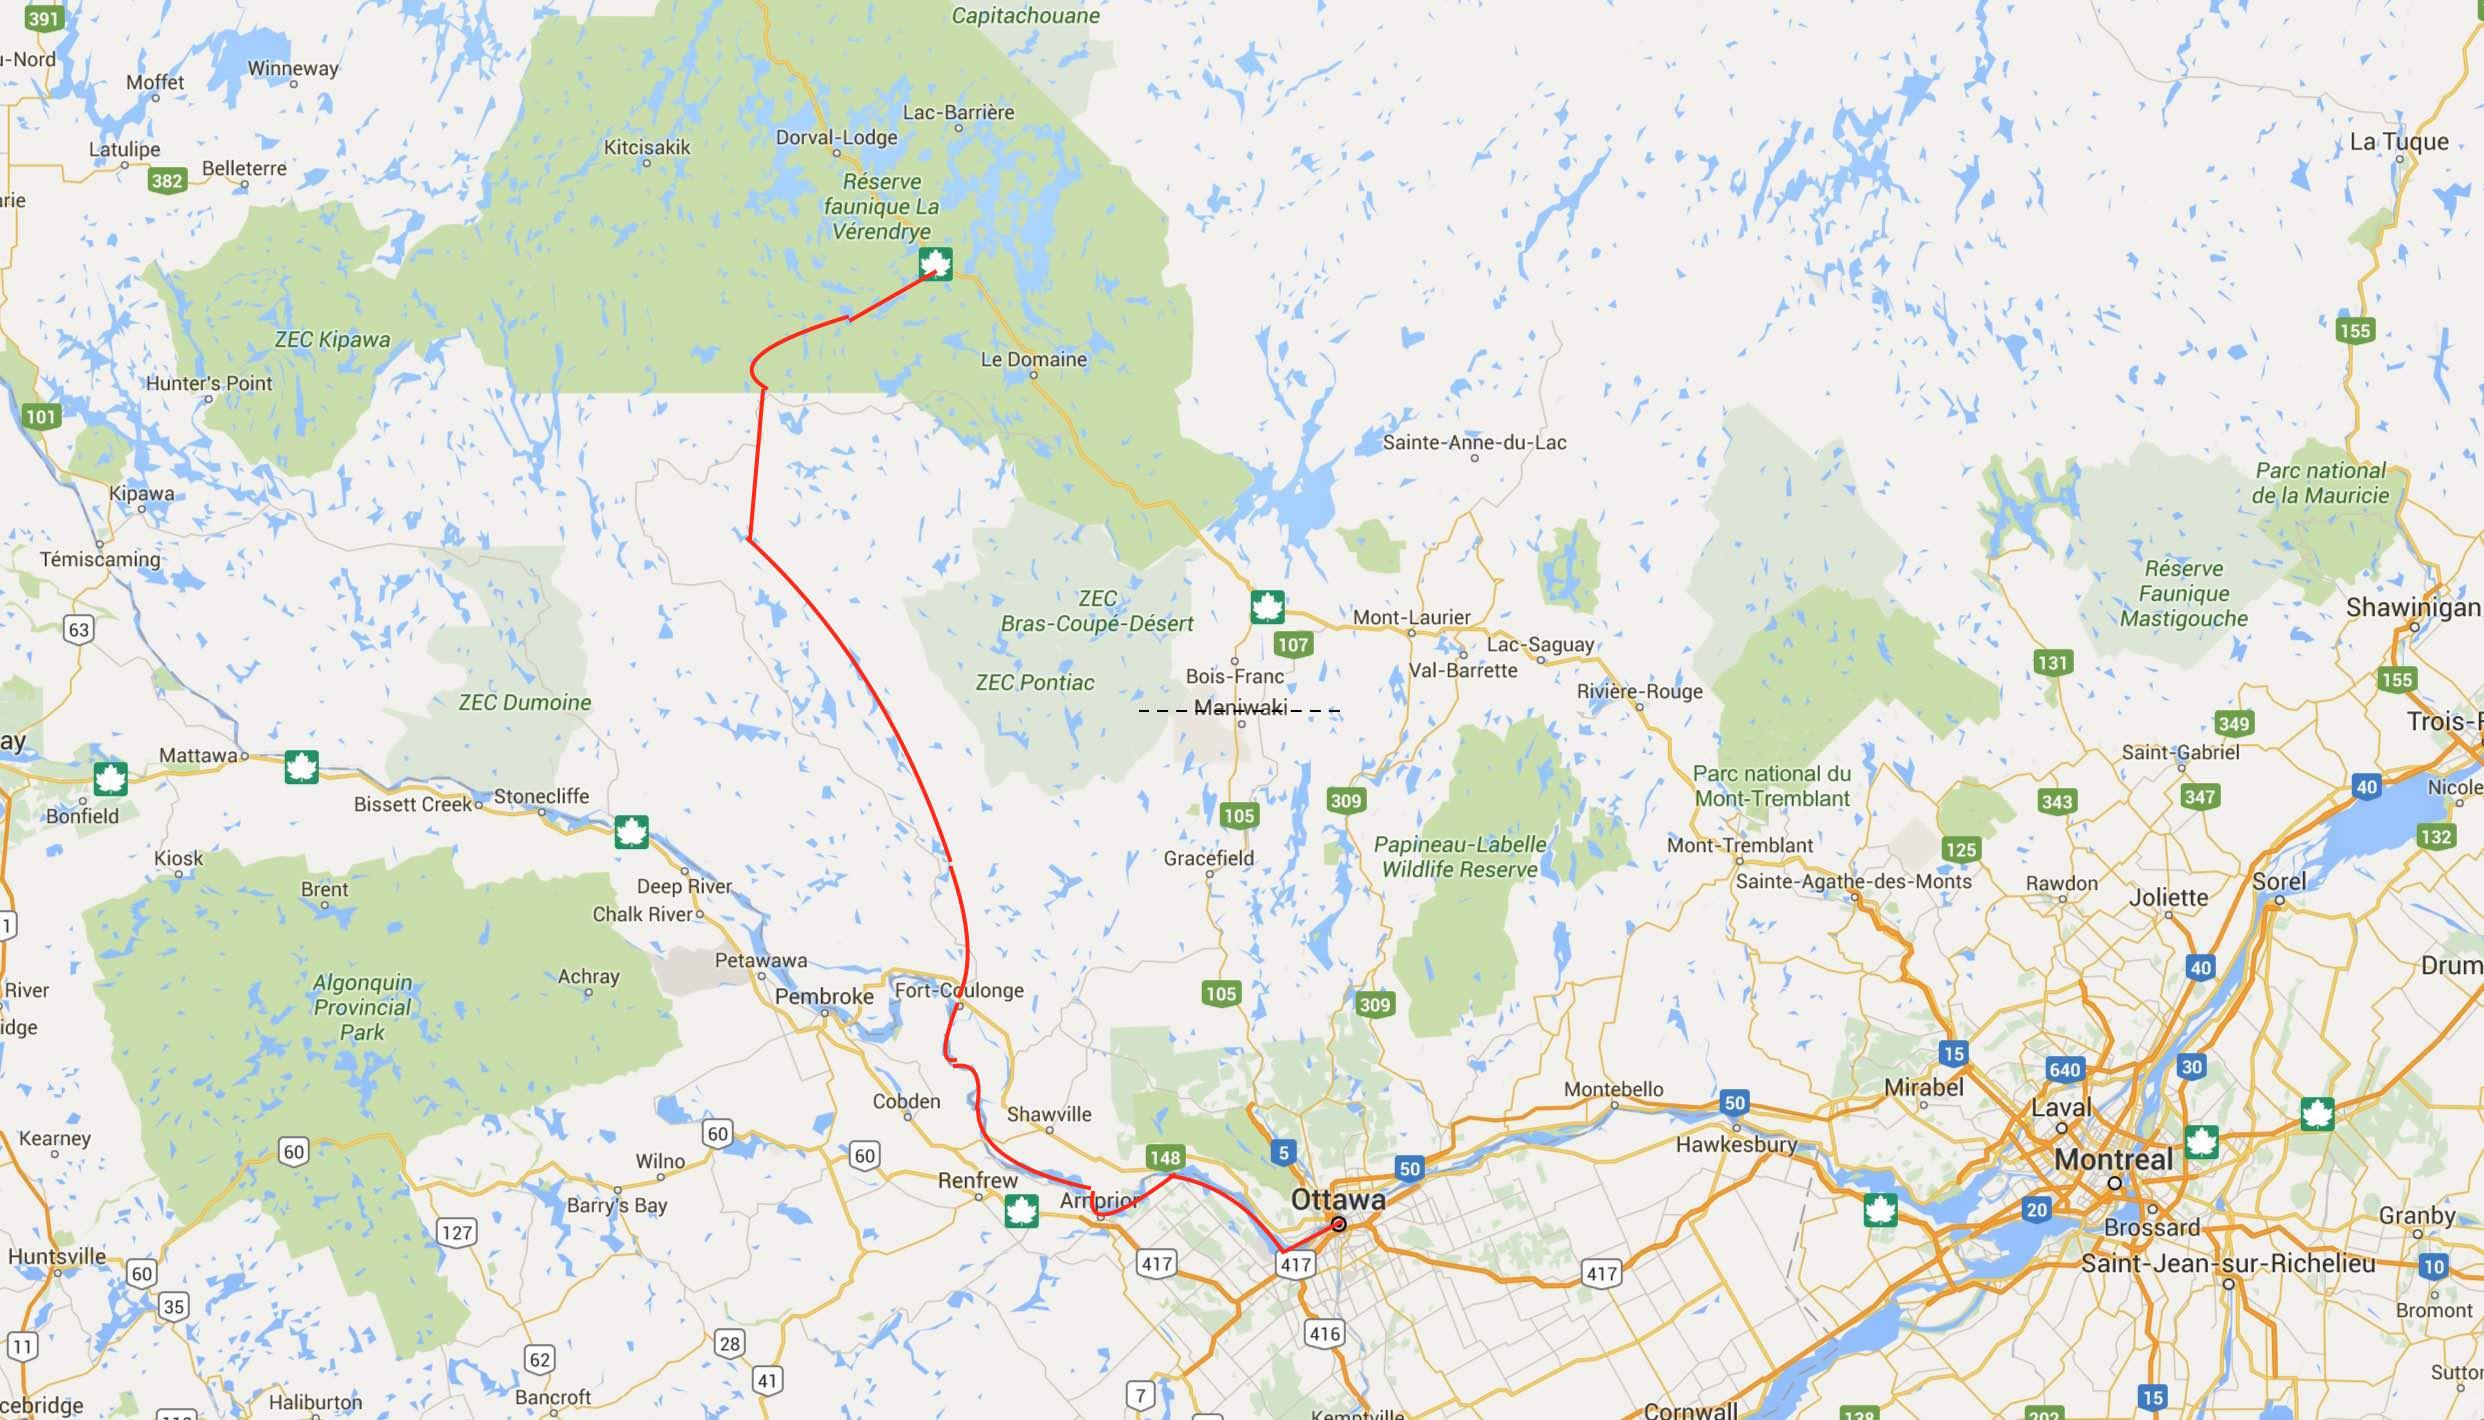 World Of Maps Travel Books Ottawa Gallery Word Map